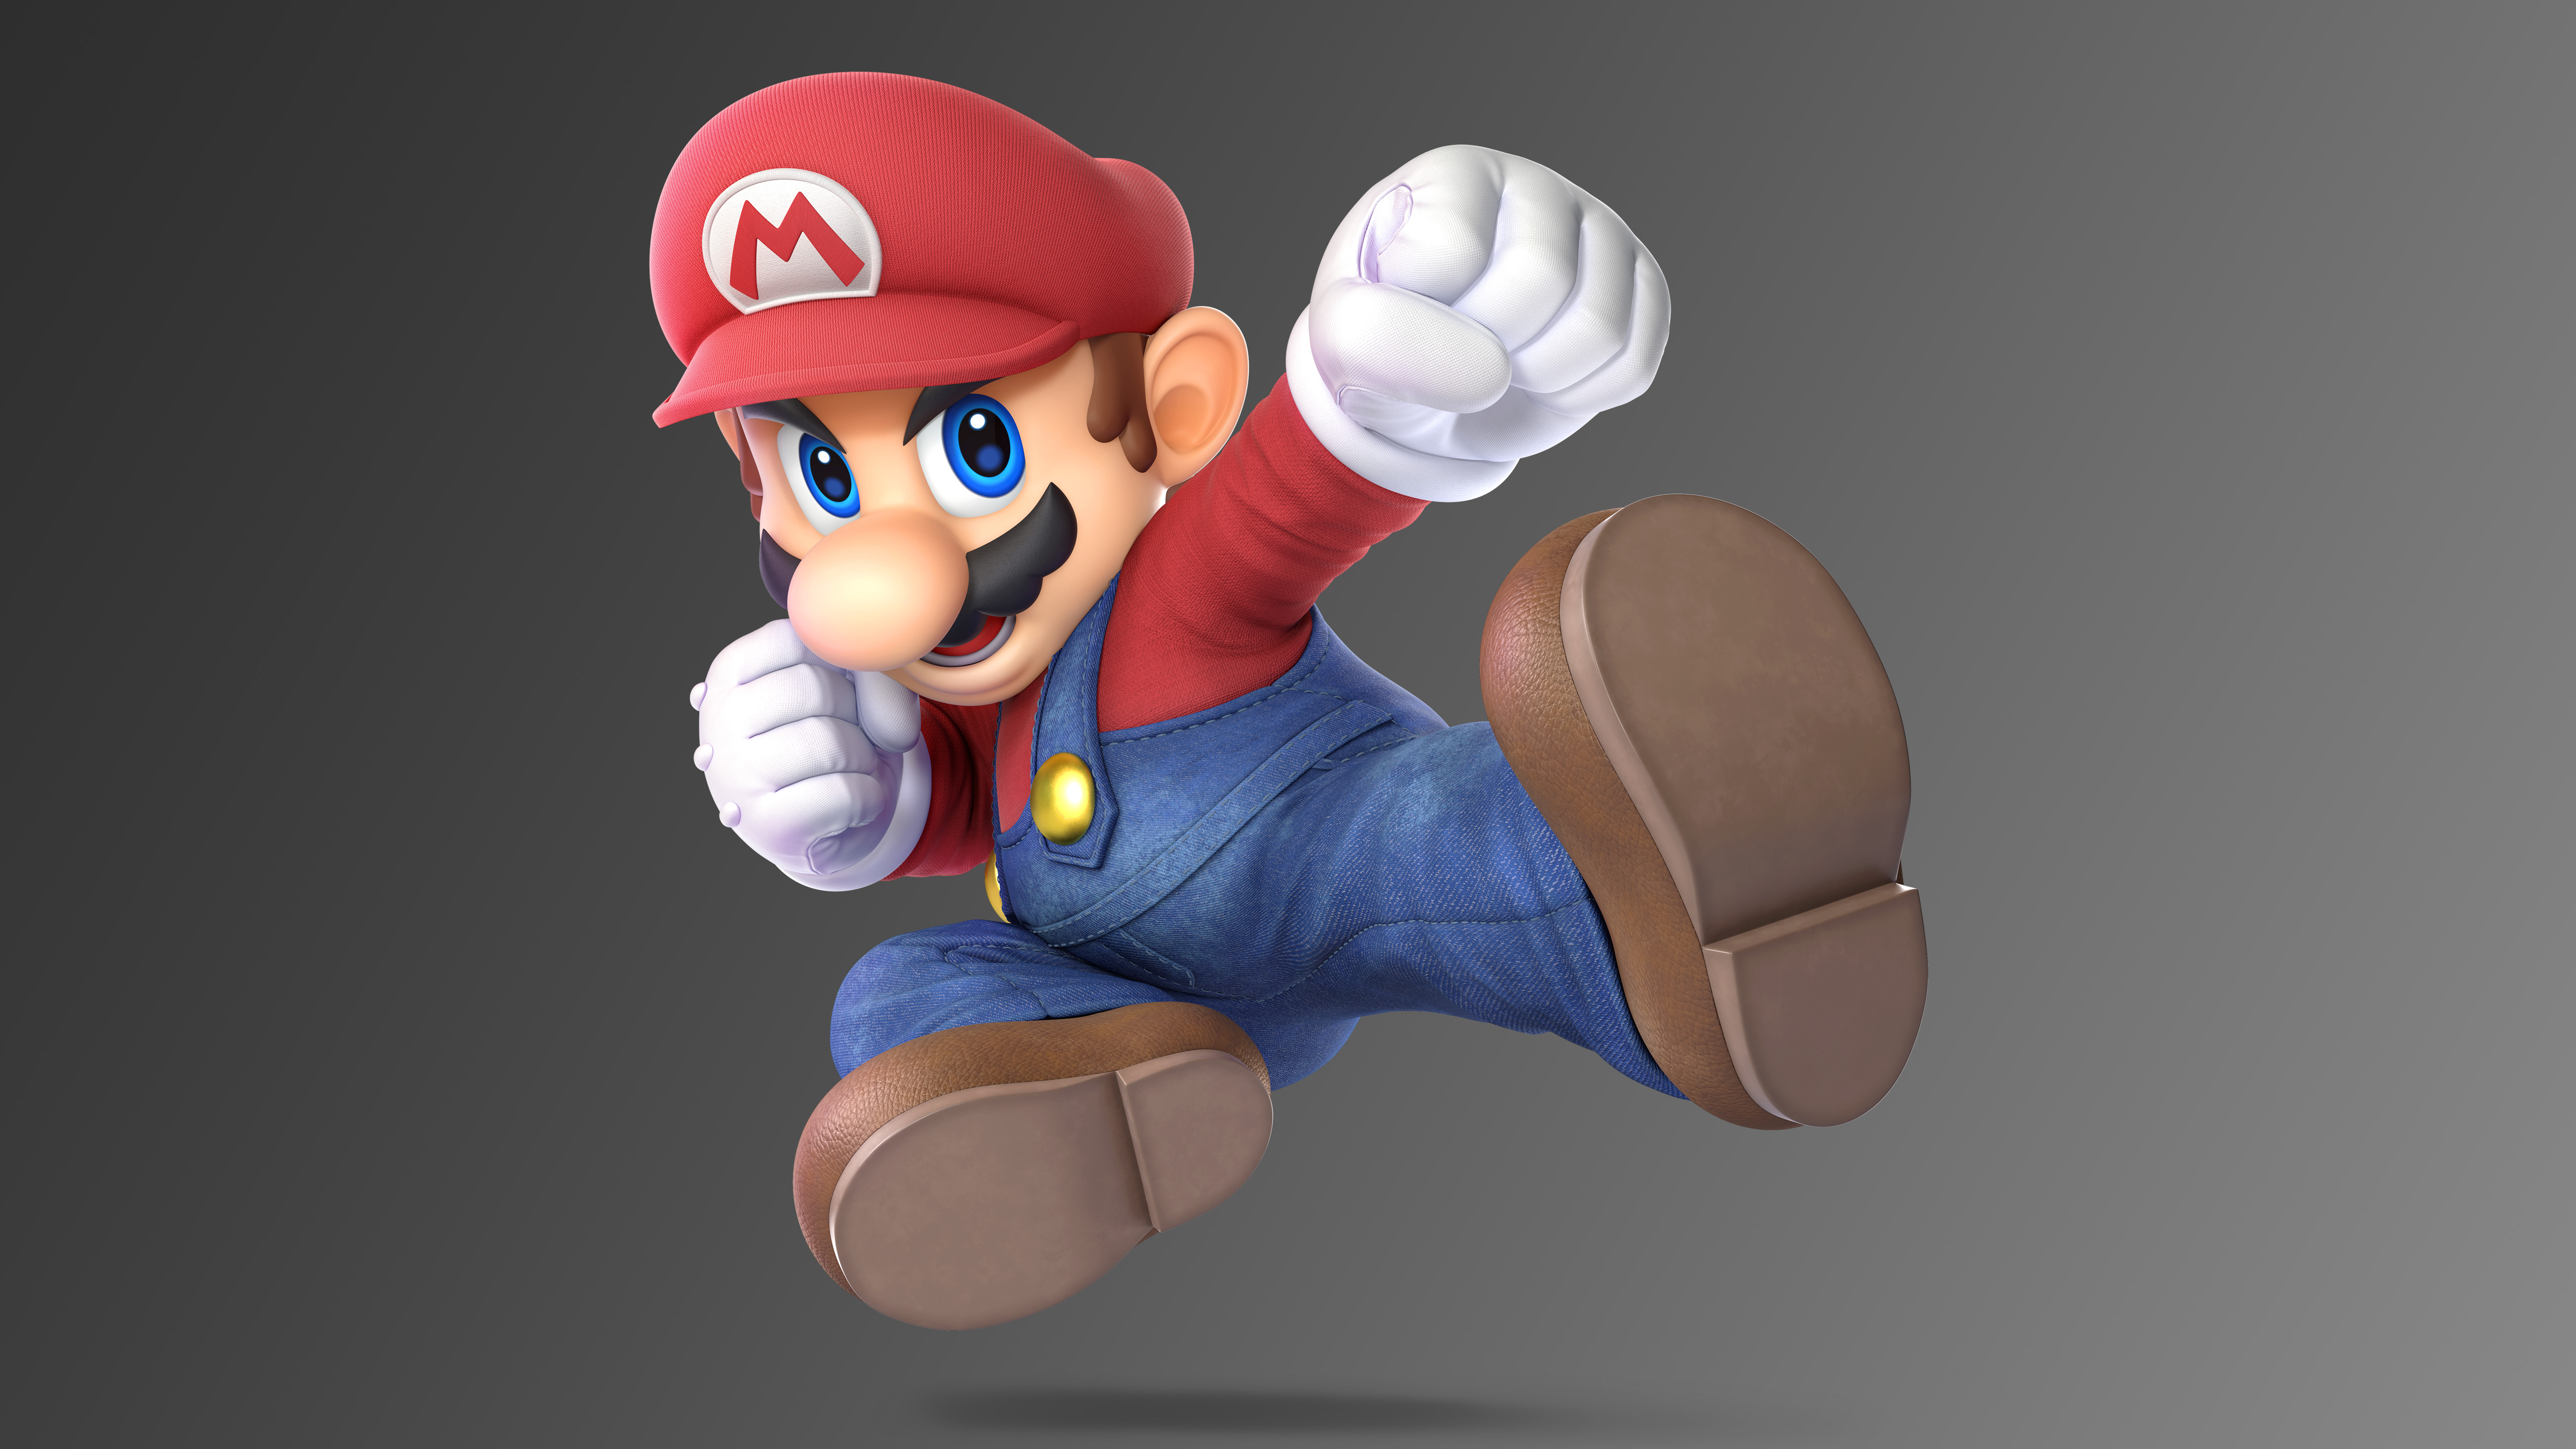 Mario Super Smash Bros Ultimate 5k Hd Games 4k Wallpapers Images